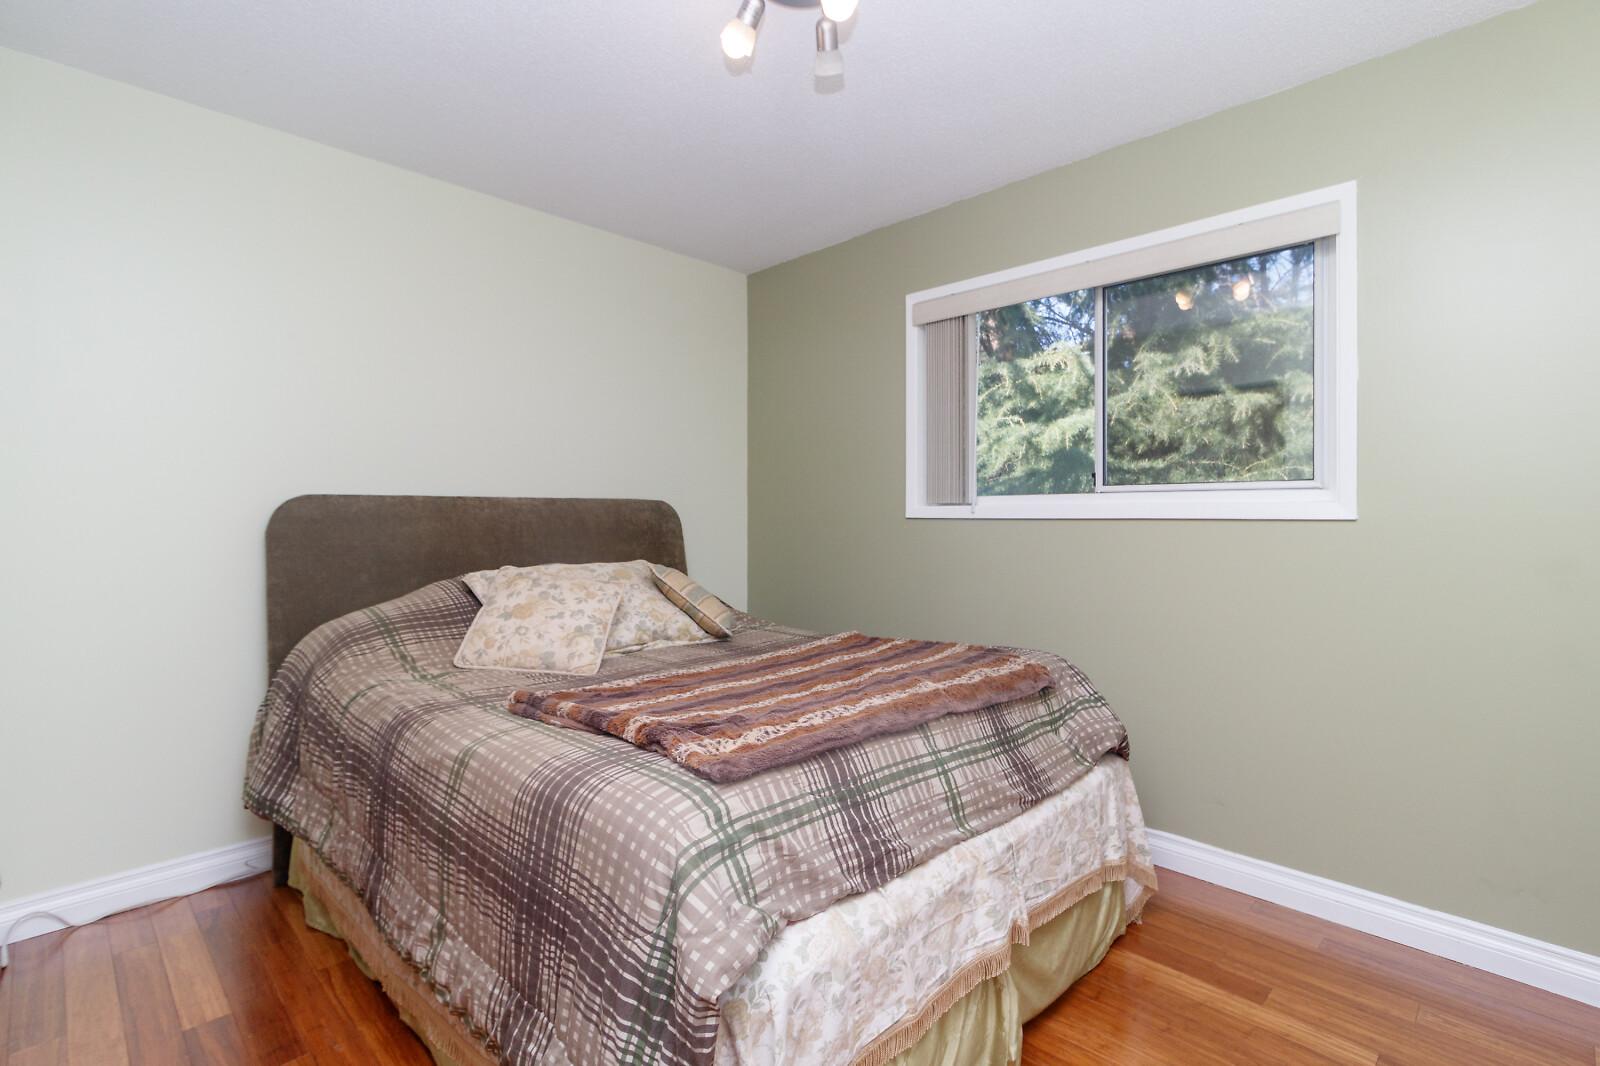 3025 Dogwood Rd, Duncan, British Columbia  V9L 6R5 - Photo 17 - 871254